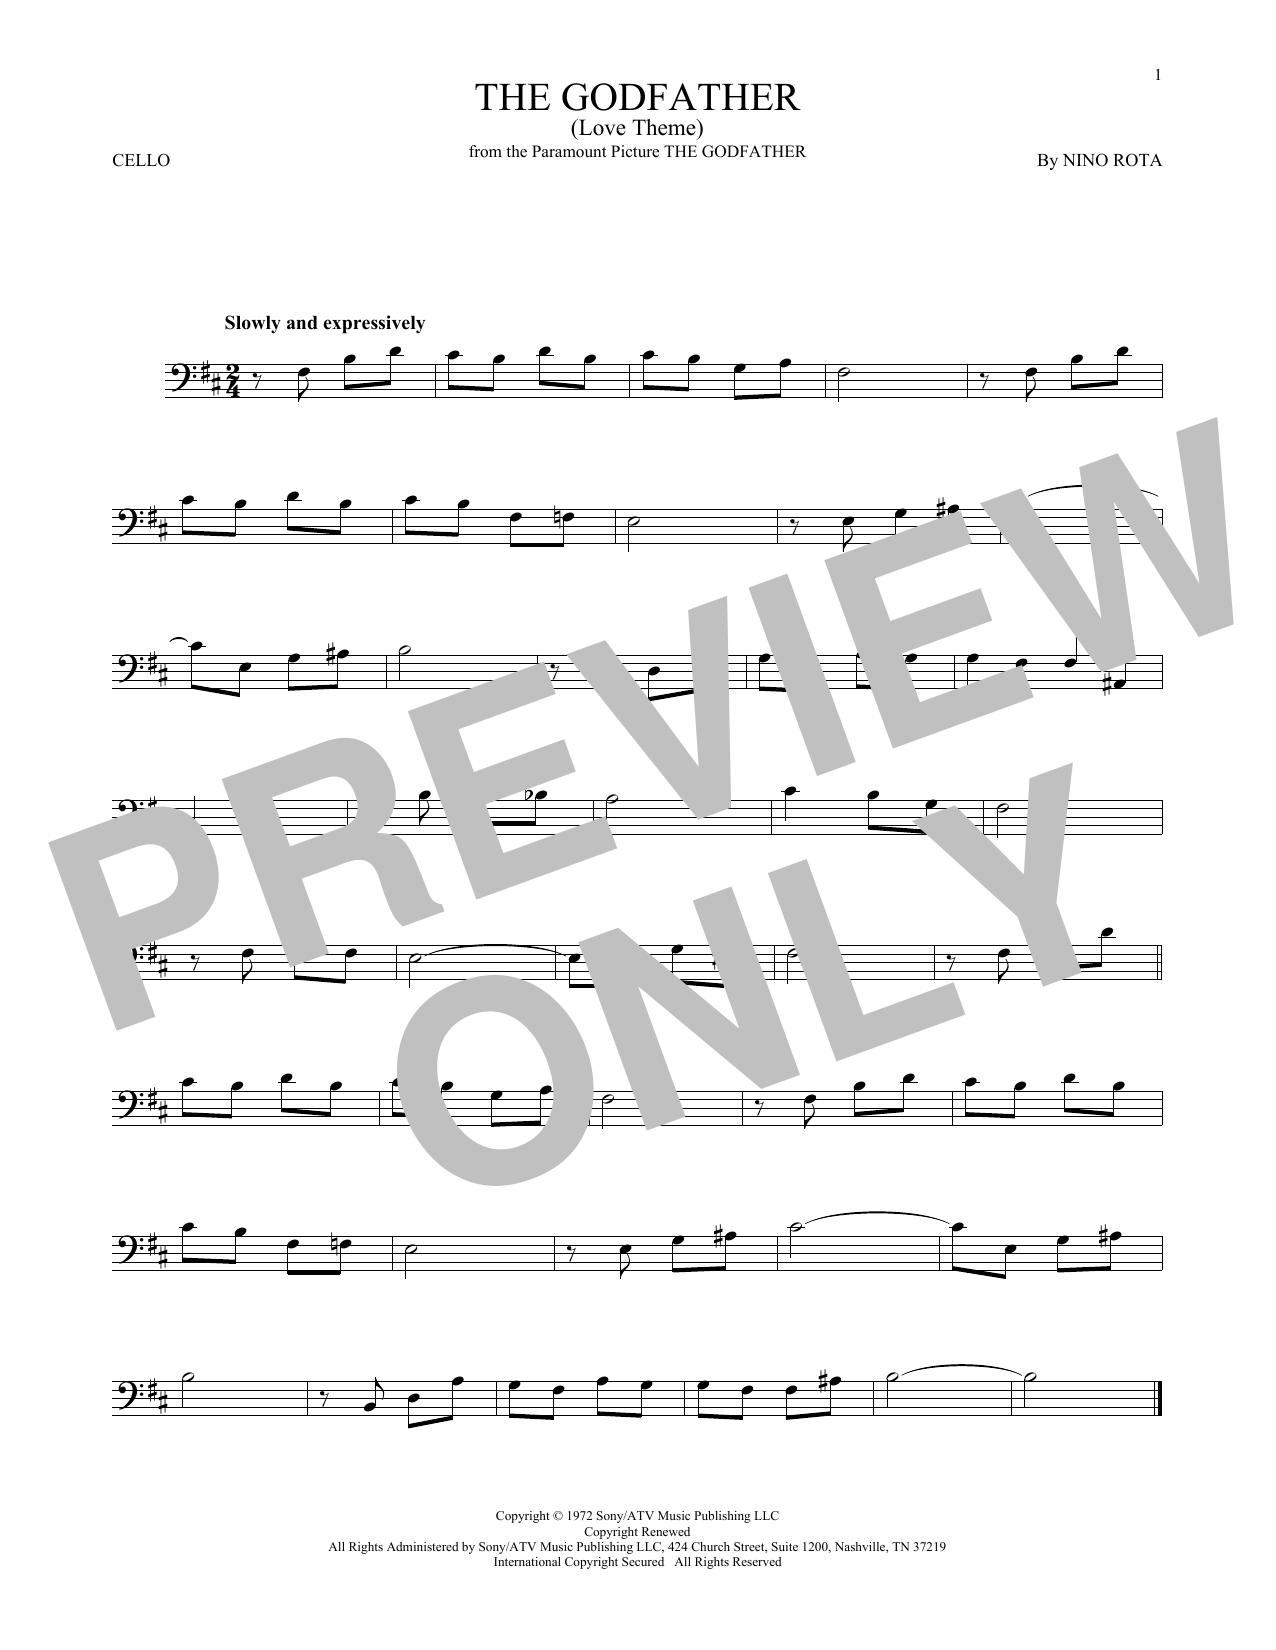 The Godfather (Love Theme) (Cello Solo)